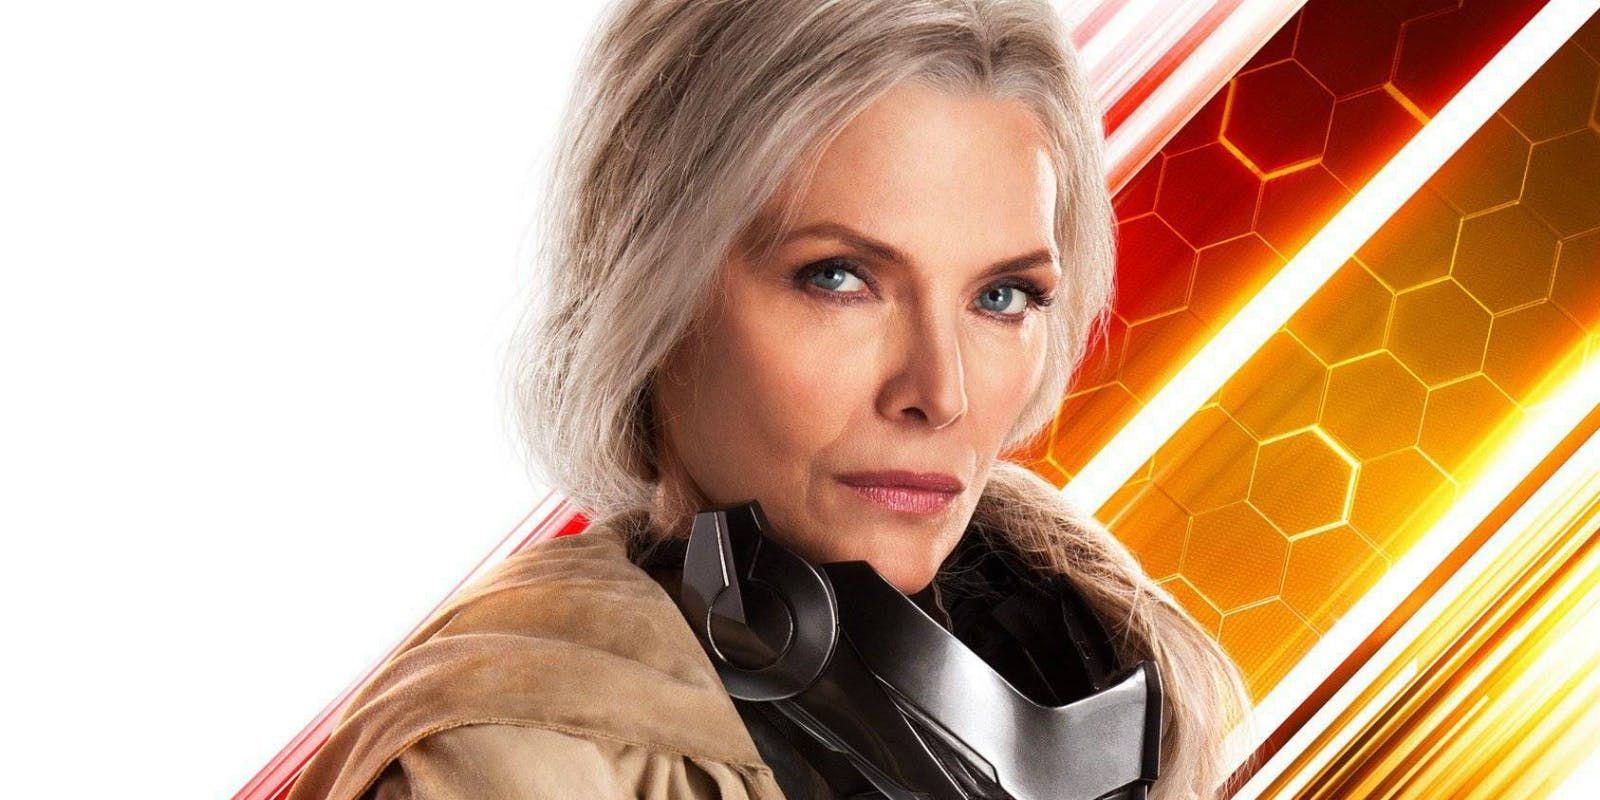 Ant Man Wasp Odeon Ant Man The Wasp Tv Spot Reveals Michelle Pfeiffer Michelle Pfeiffer Ganze Filme Filme Stream